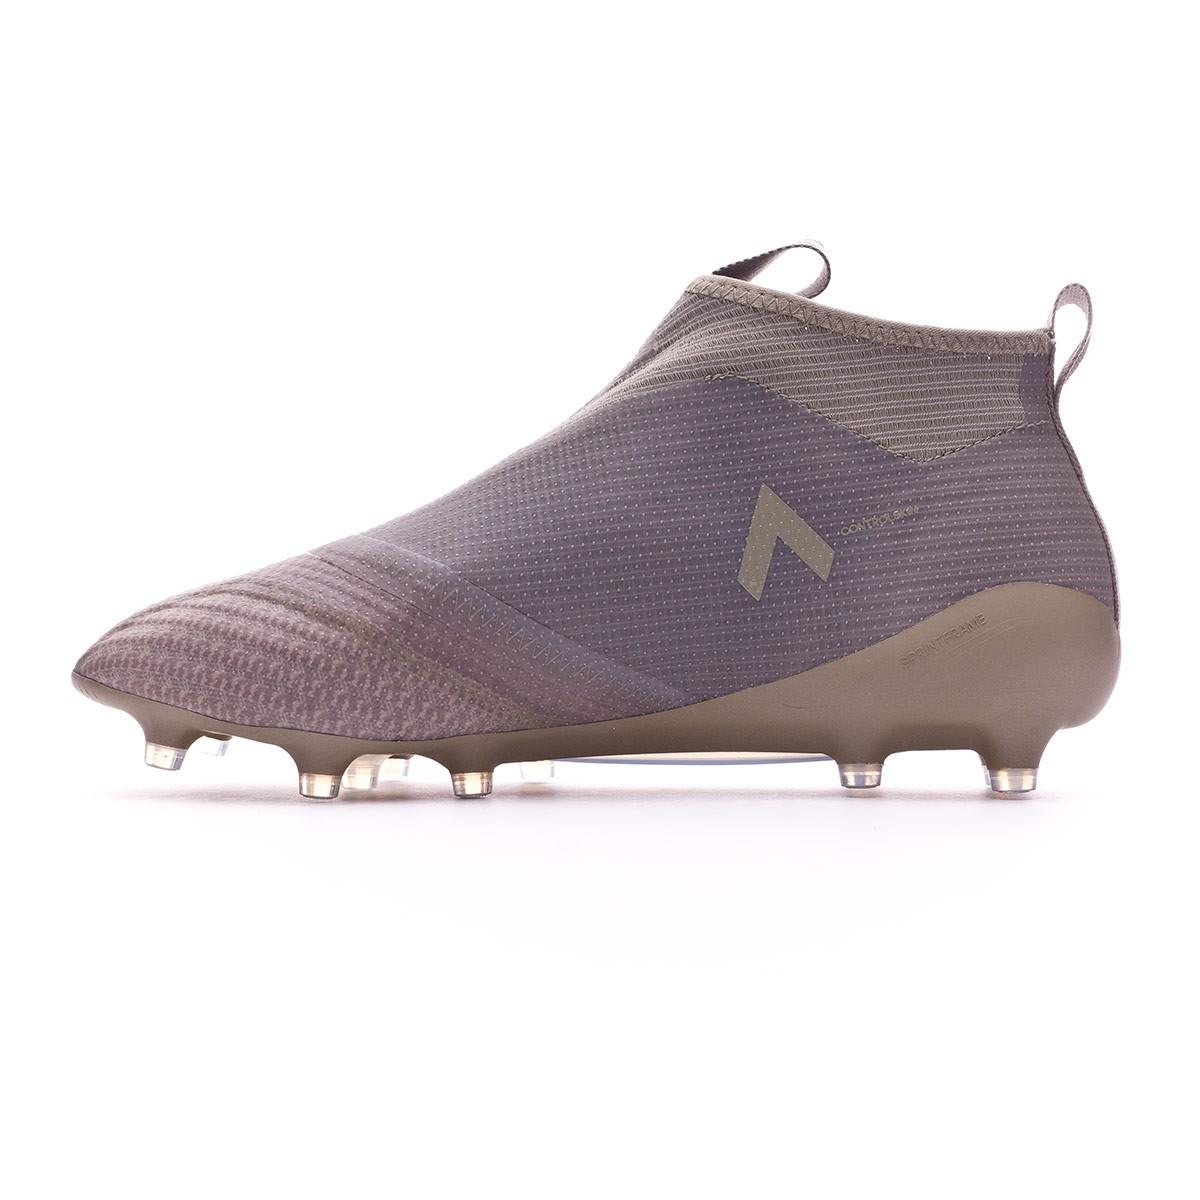 efa7470046eda Football Boots adidas Ace 17+ Purecontrol FG Clay-Sesame - Tienda de fútbol  Fútbol Emotion